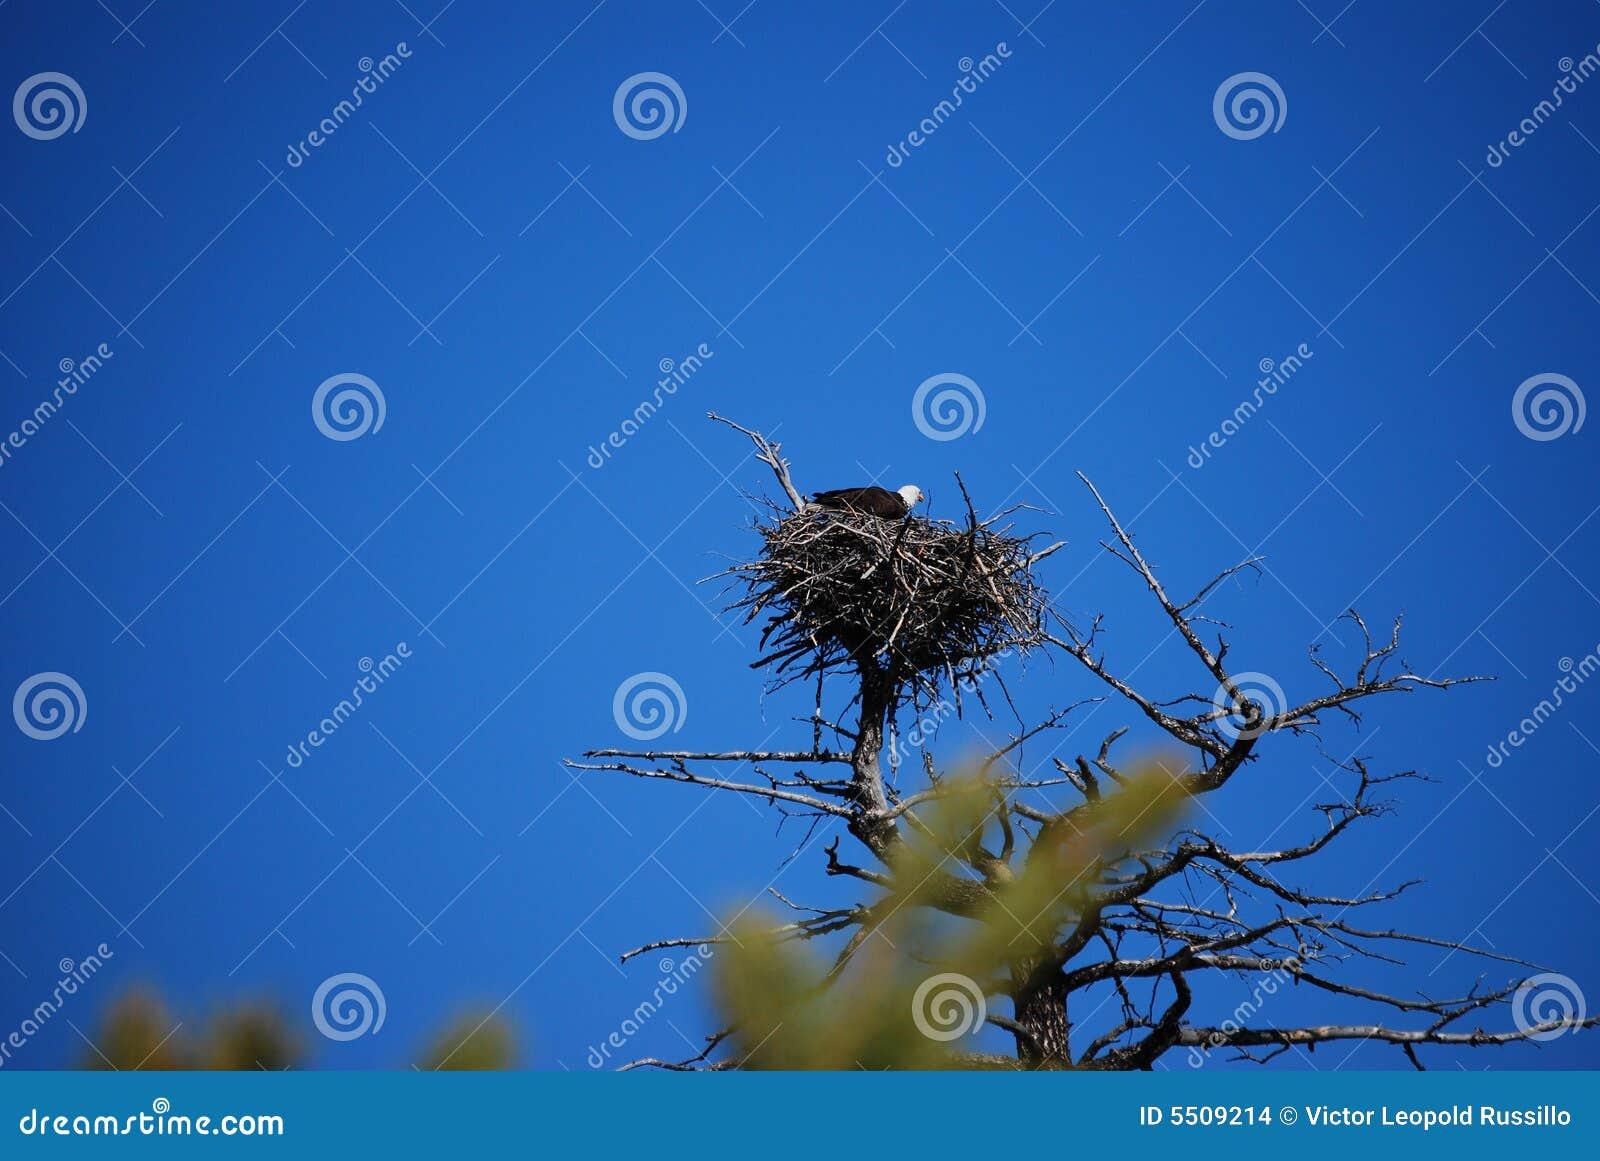 Bald Eagle In Aerie Nest Stock Photo Image Of Vivid Nest 5509214